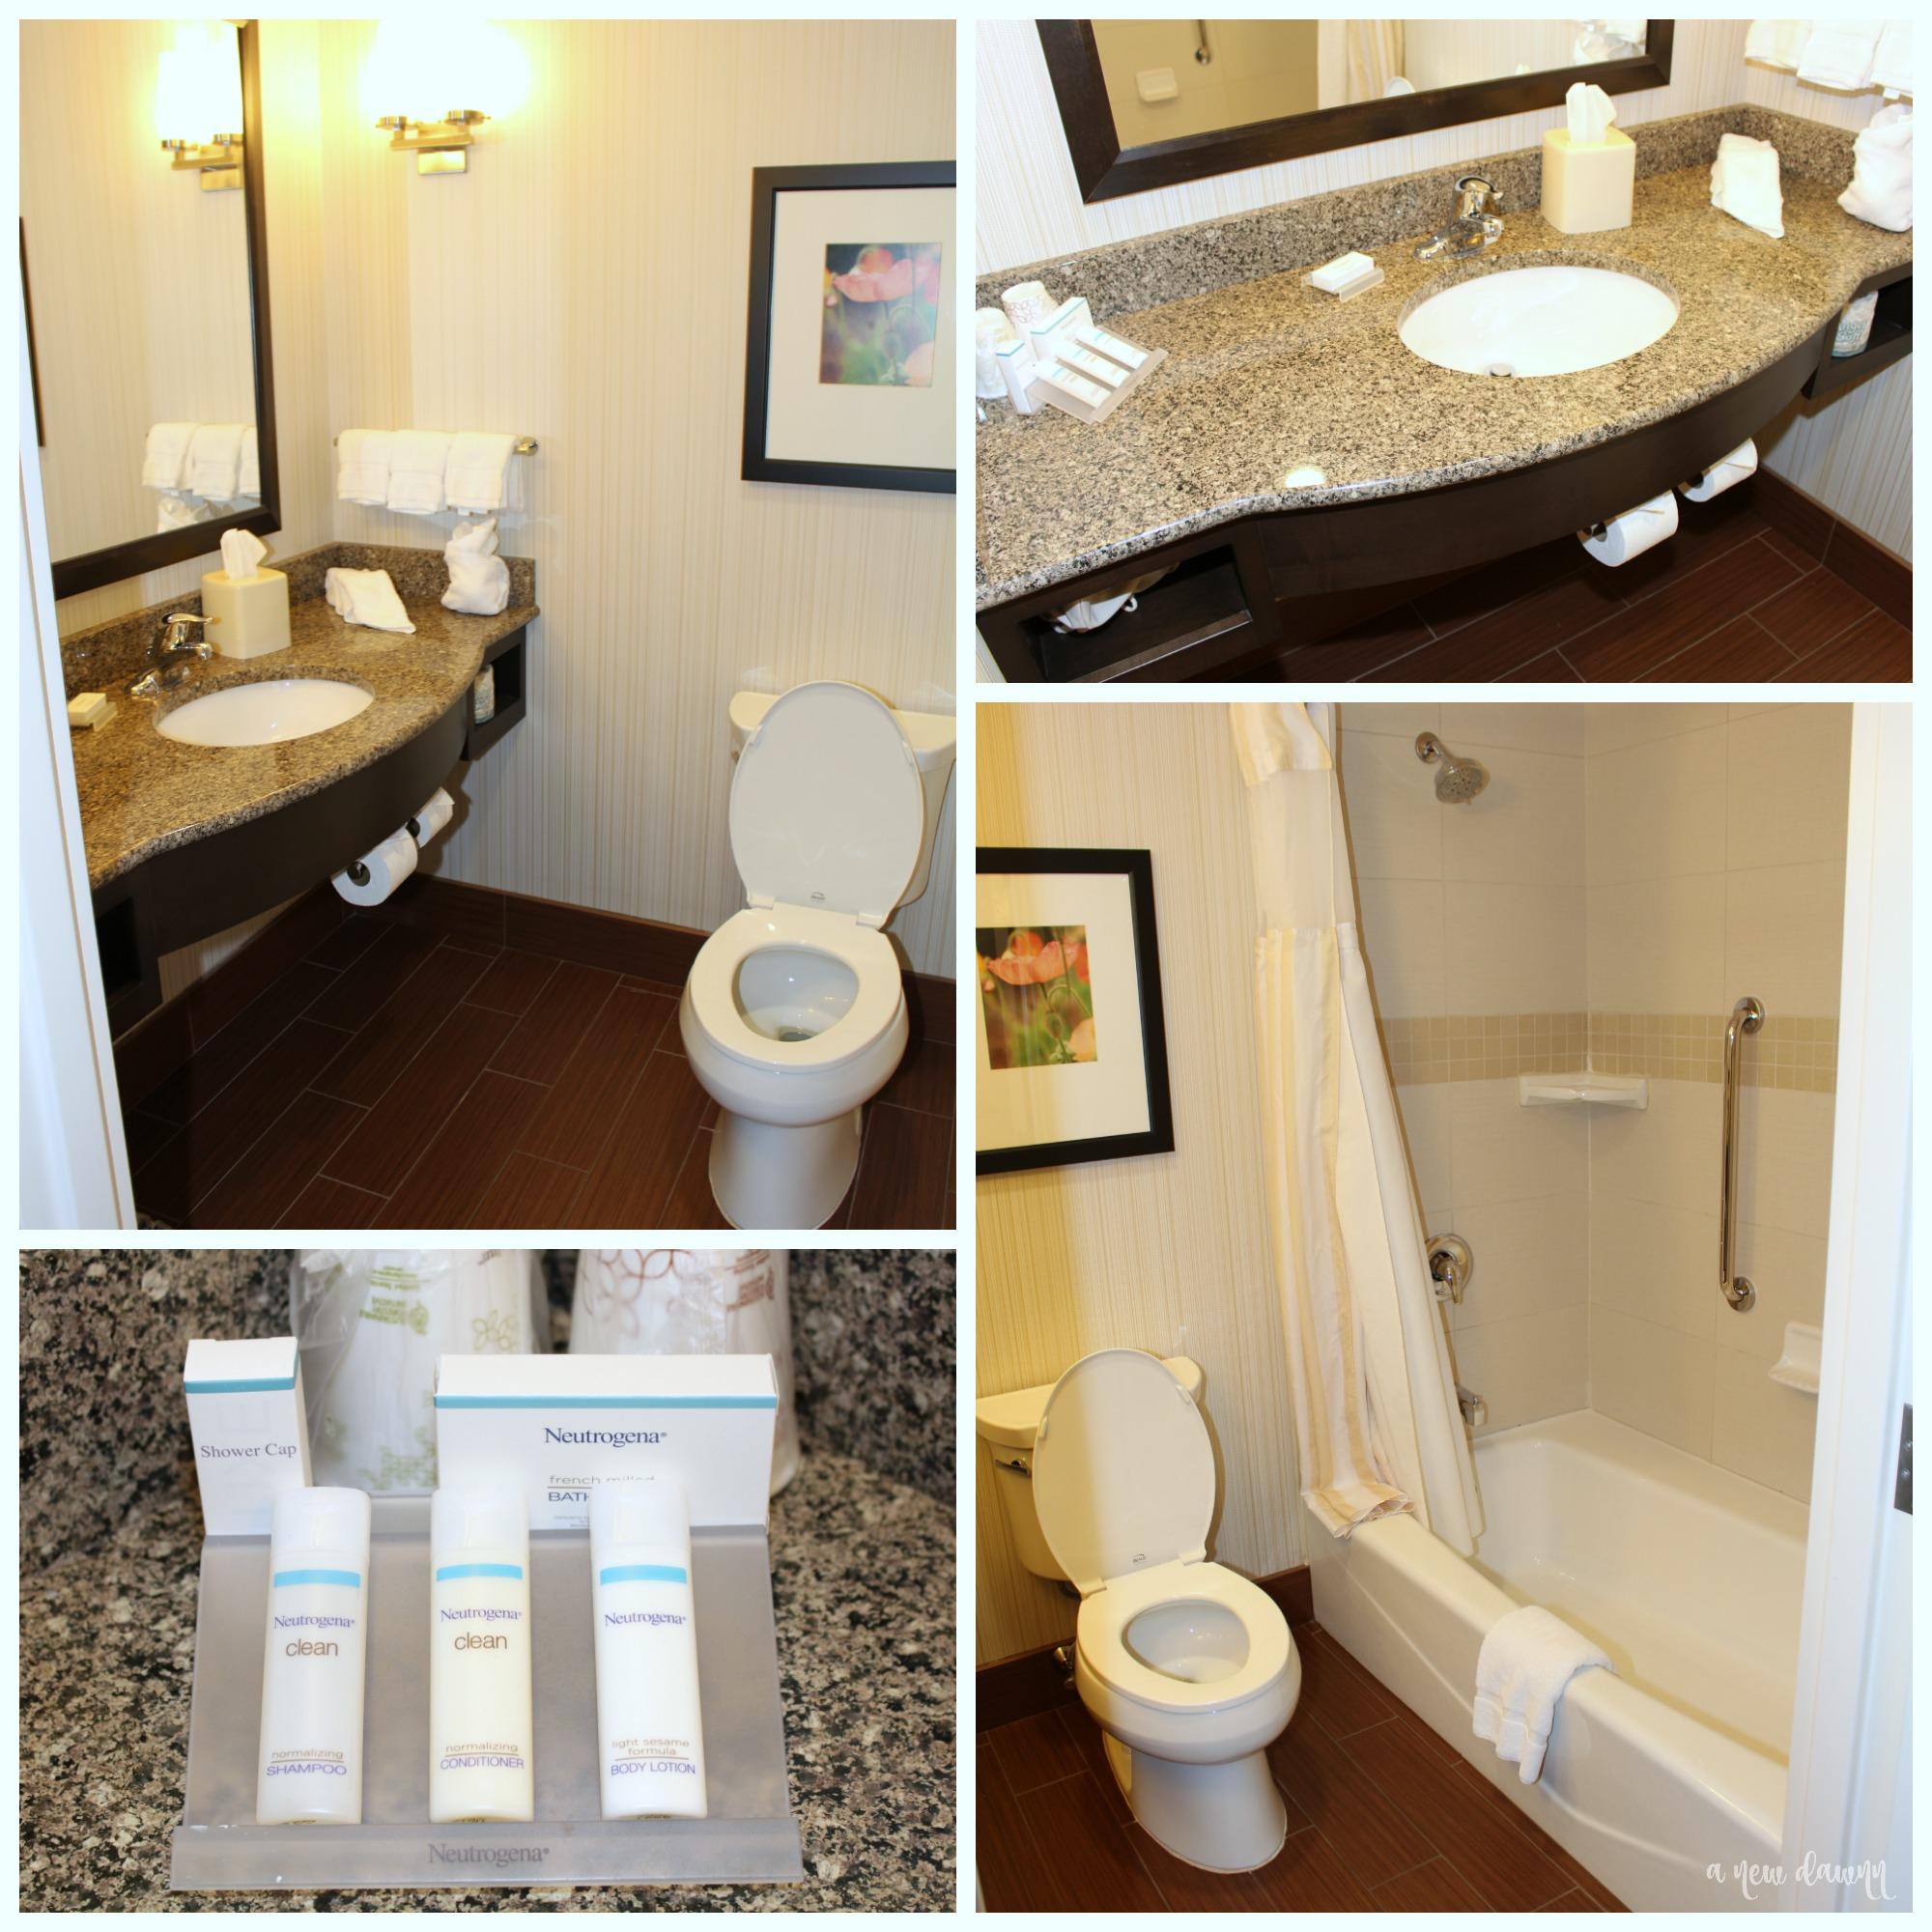 Bathrooms at the Hilton Garden Inn Hershey